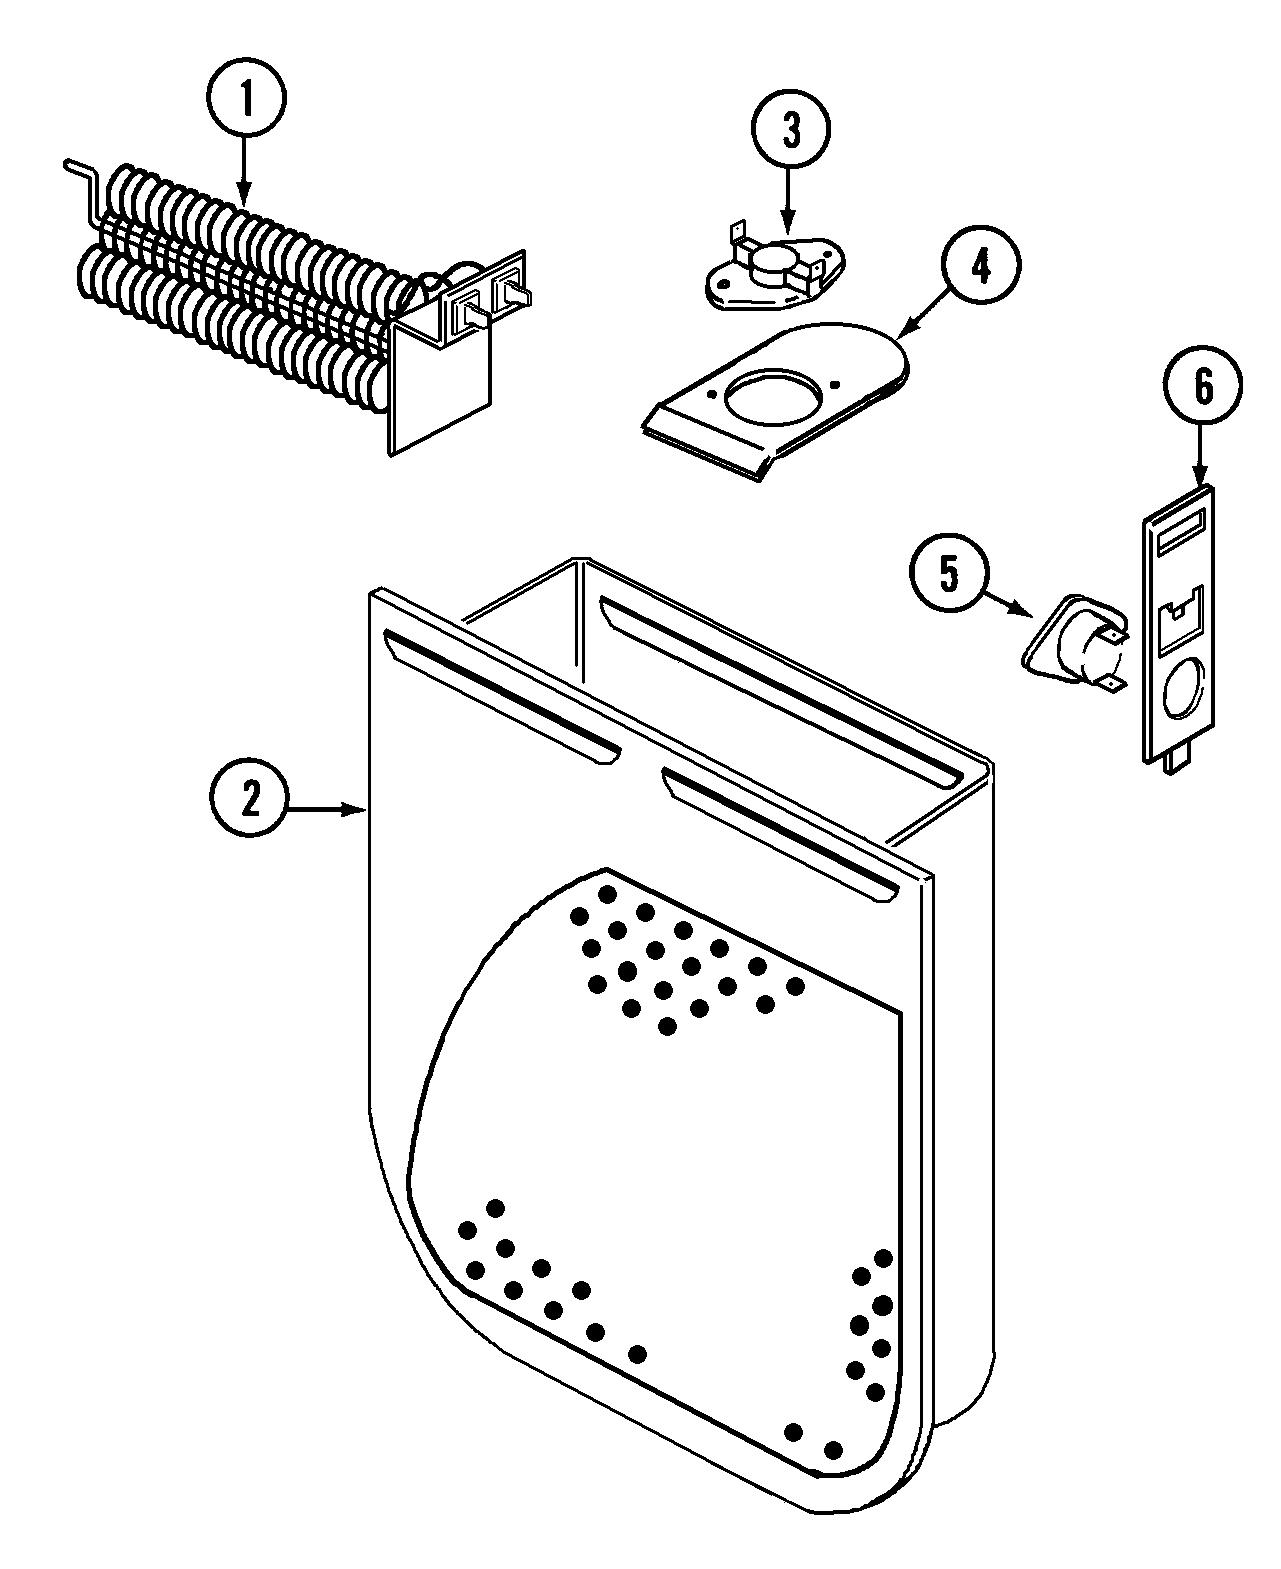 medium resolution of wiring diagram for maytag dg312 gas dryer appliance repair forum wiring diagram show